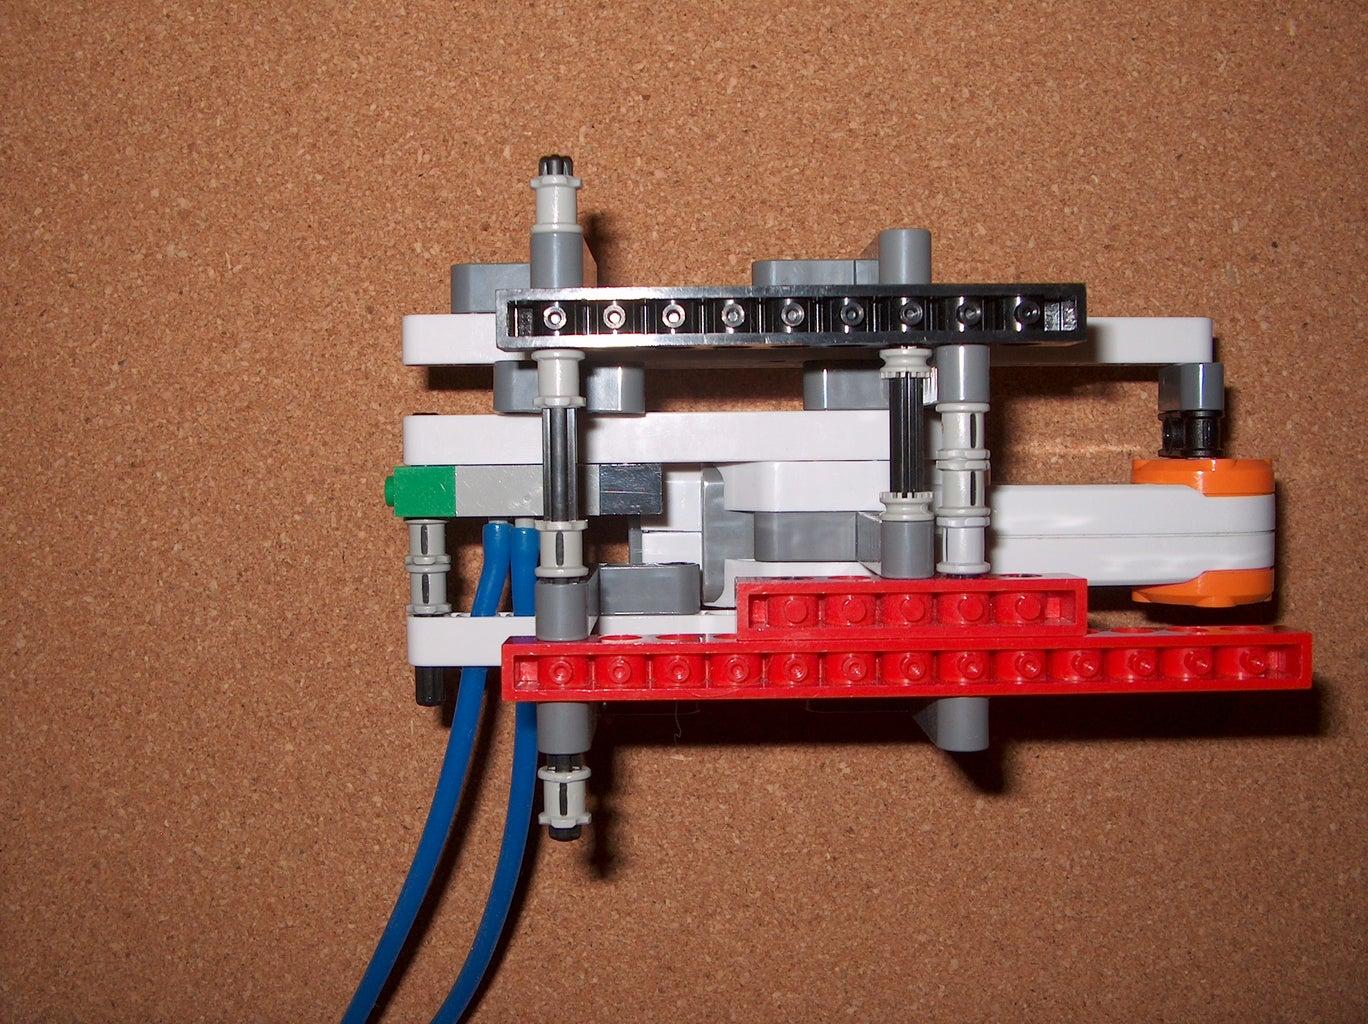 Make the Extruder Control Valve